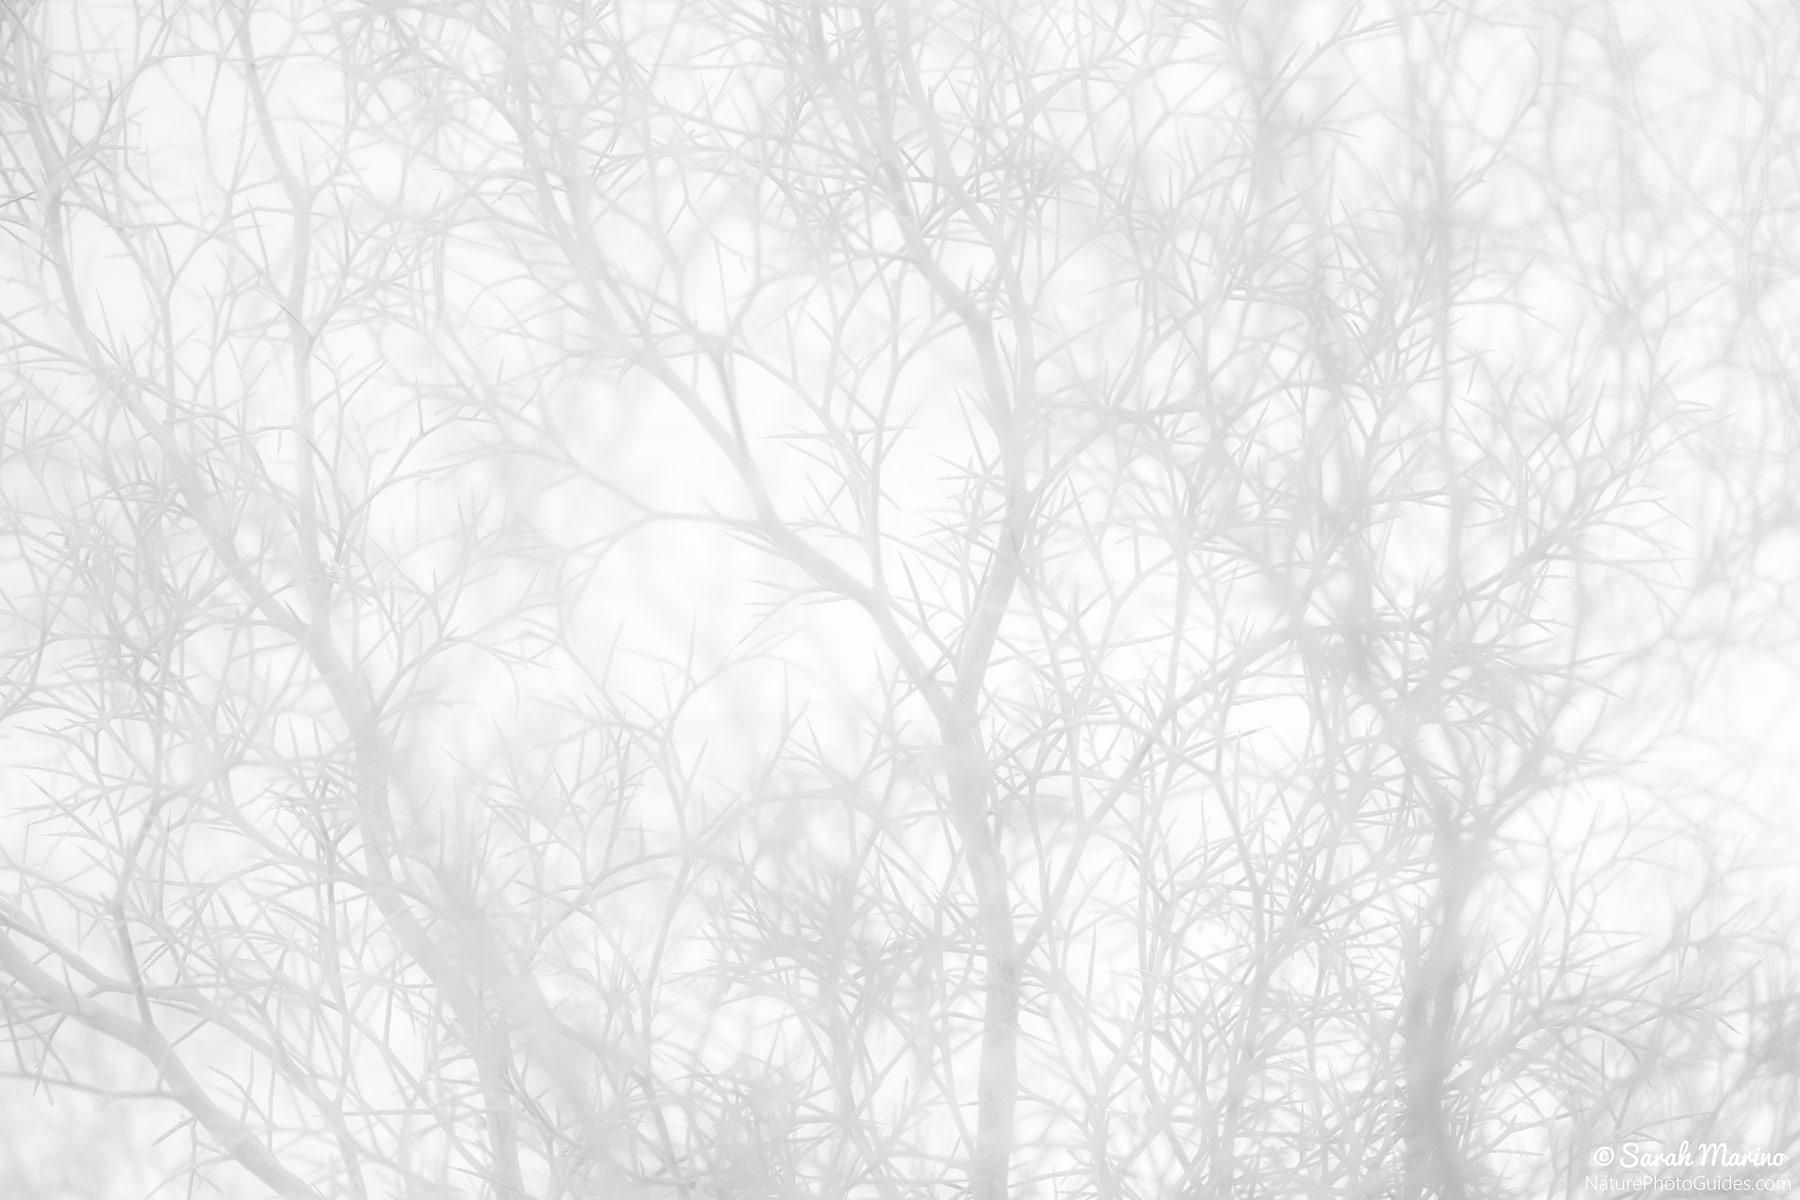 Sarah-Marino-Smoke-Tree-Abstract-Black-White-1200px.jpg